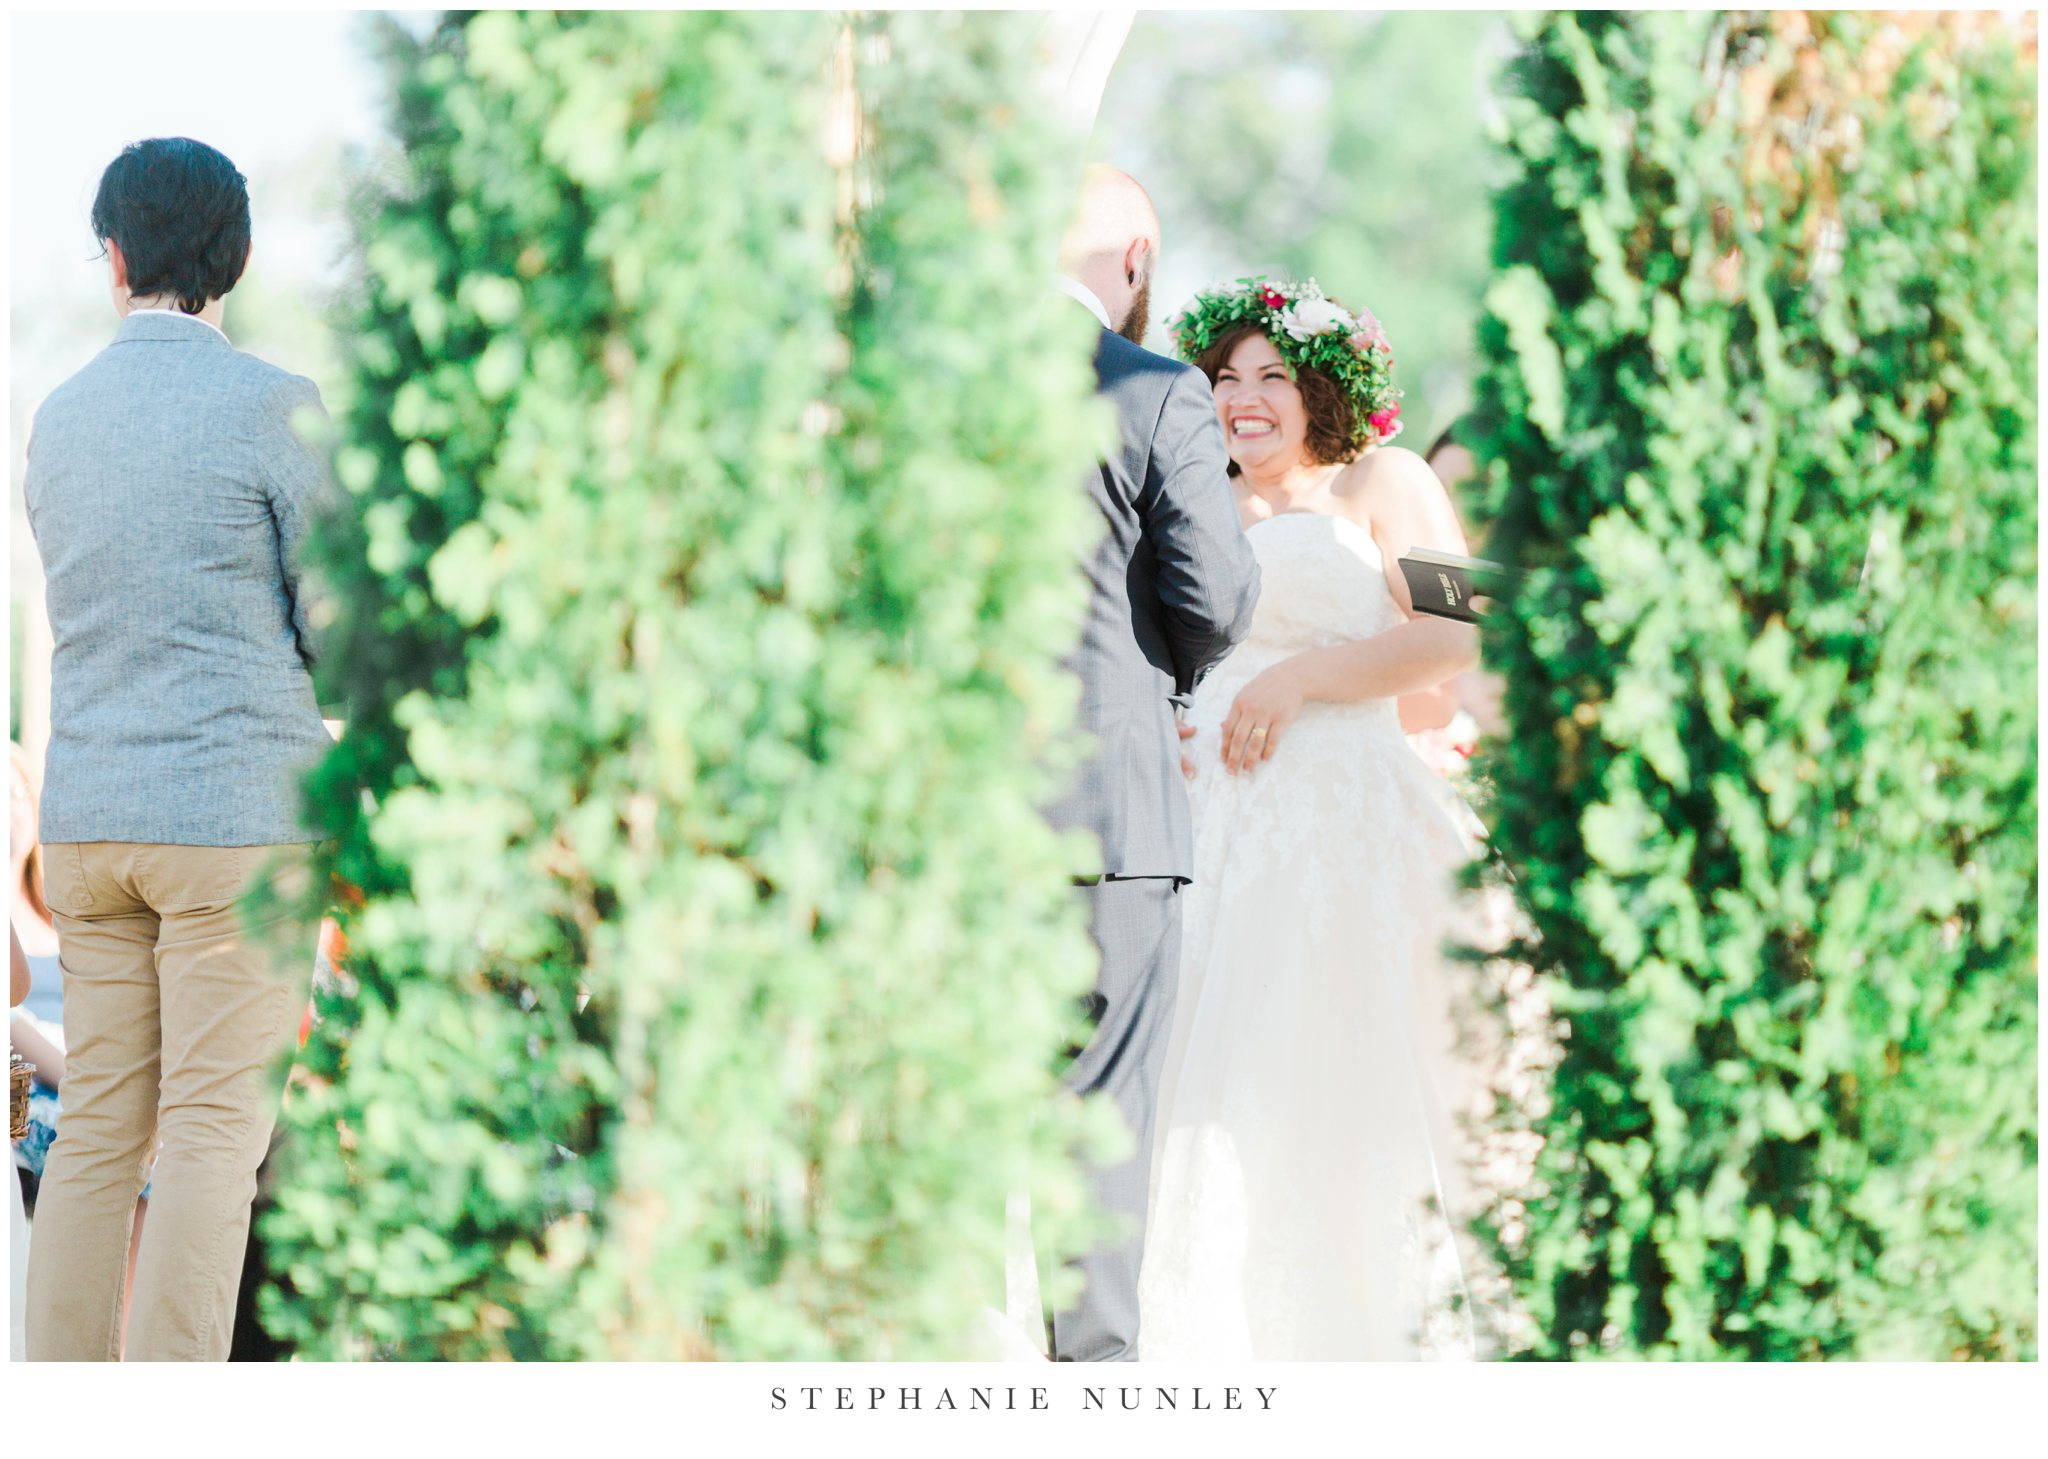 romantic-outdoor-wedding-with-flower-crown-0095.jpg